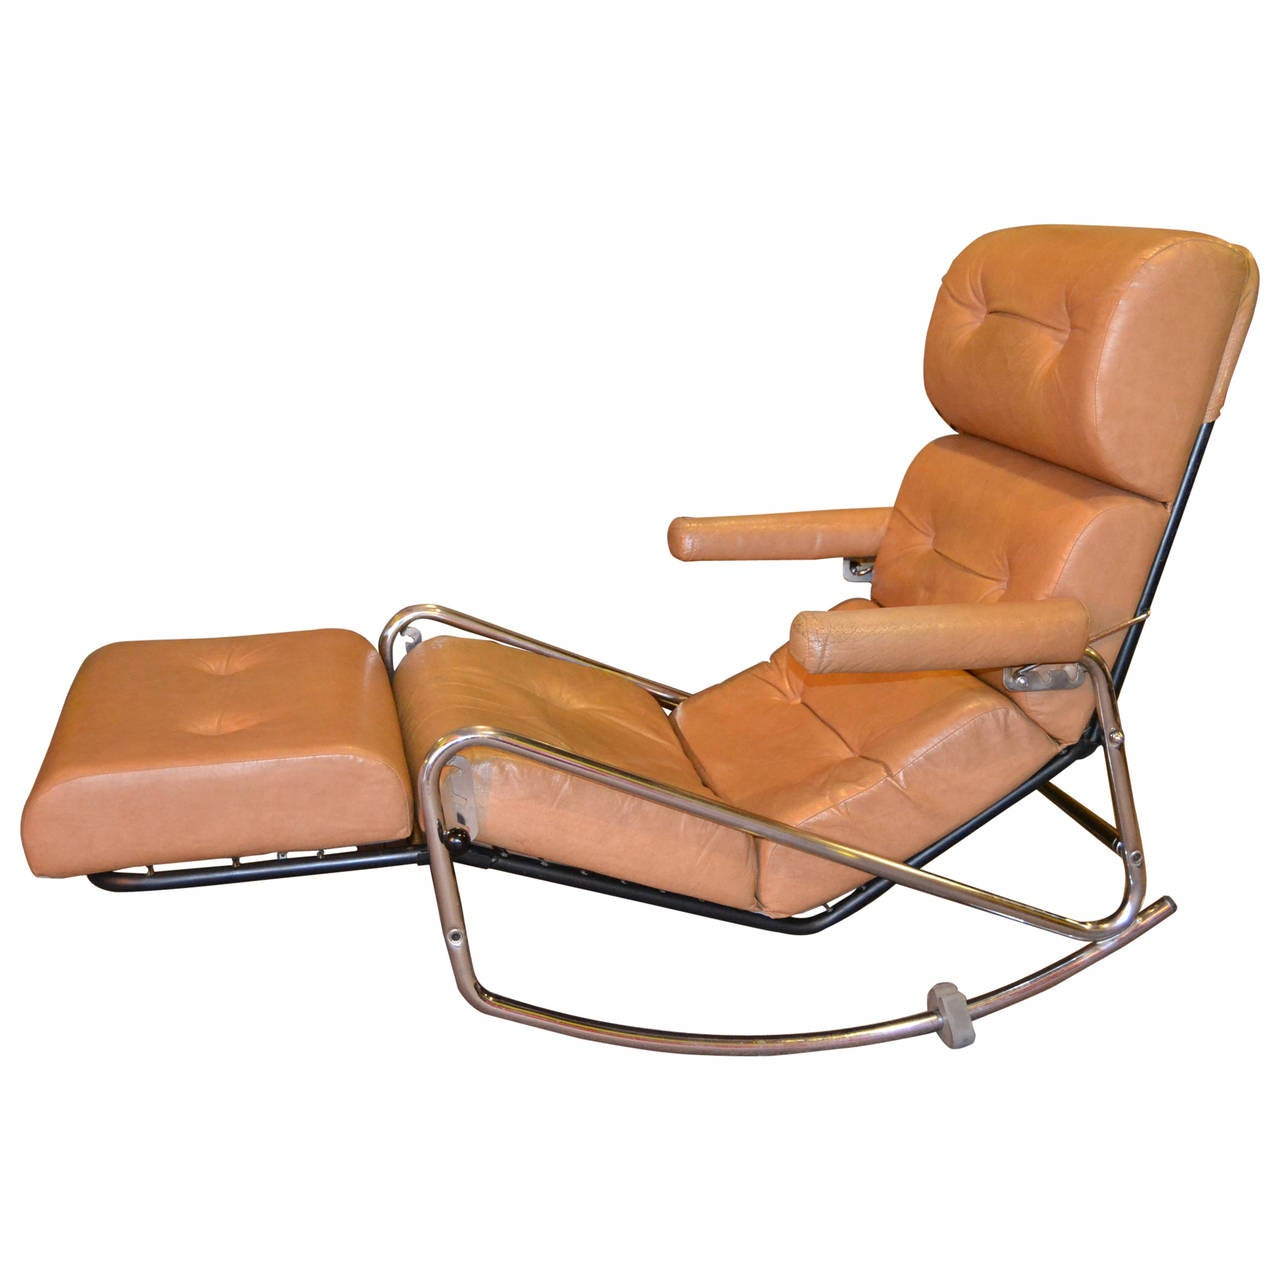 1960s Vintage Lama Chrome Lounge Rocking Chair At 1stdibs